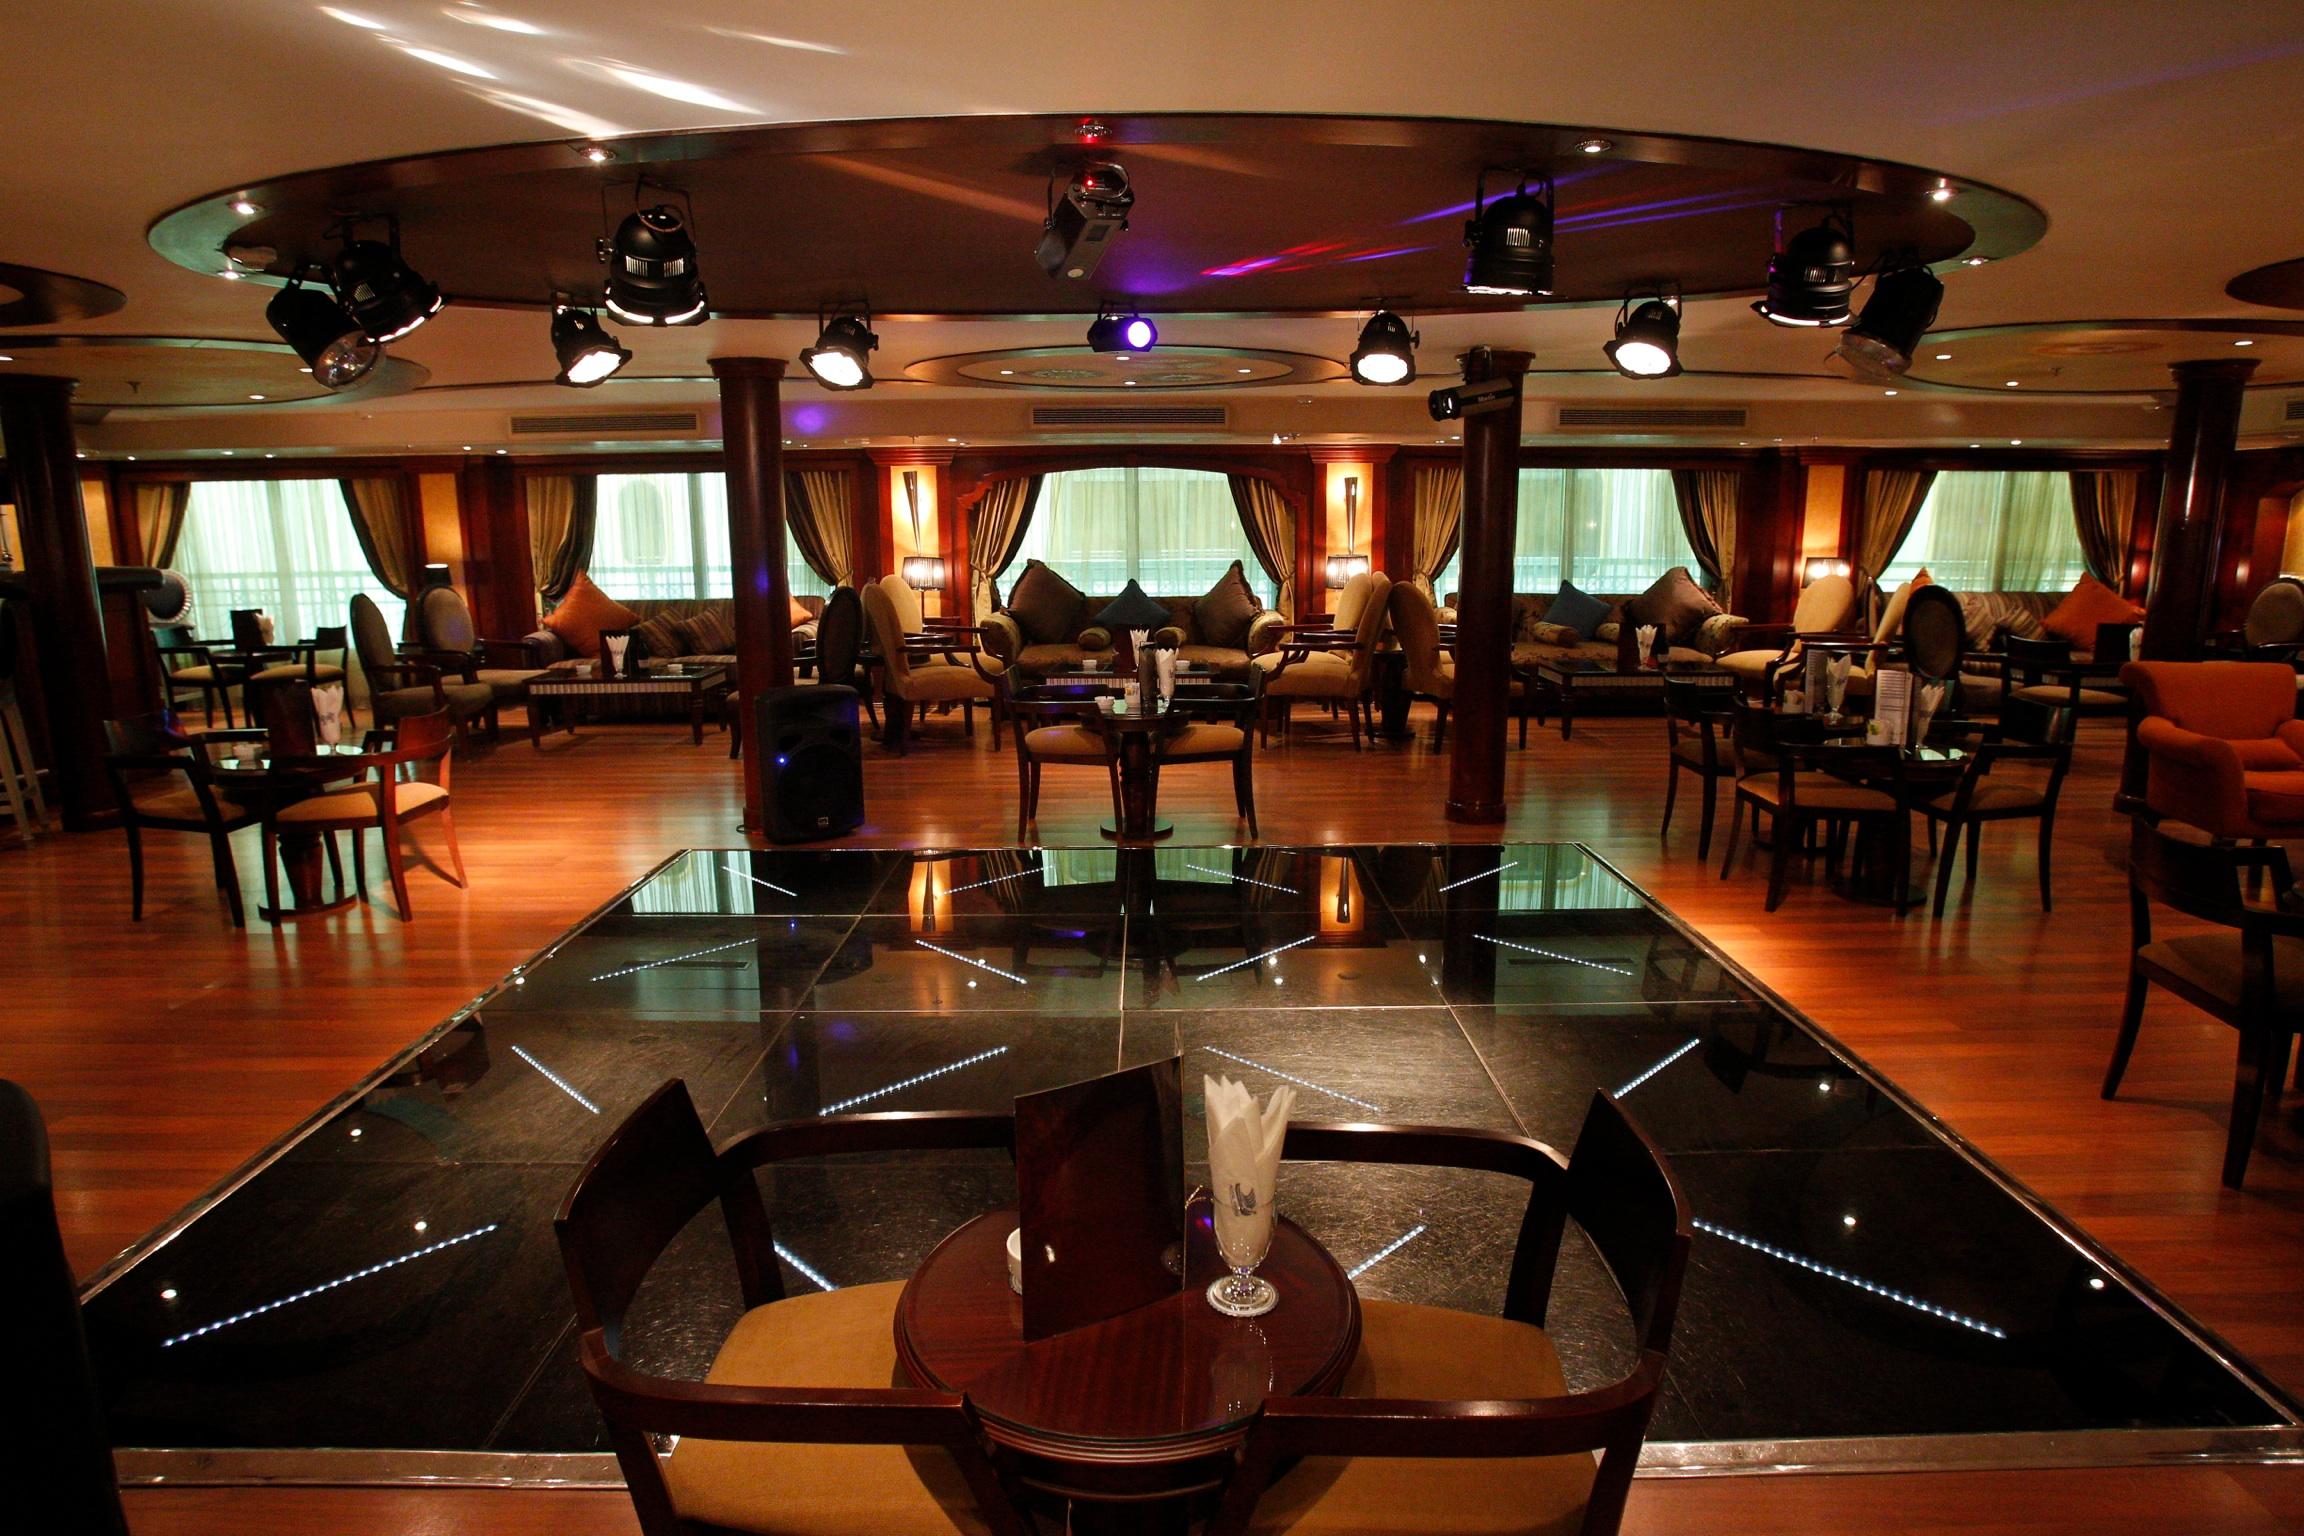 Egypten rundrejse Nilecruise Royal Viking bar